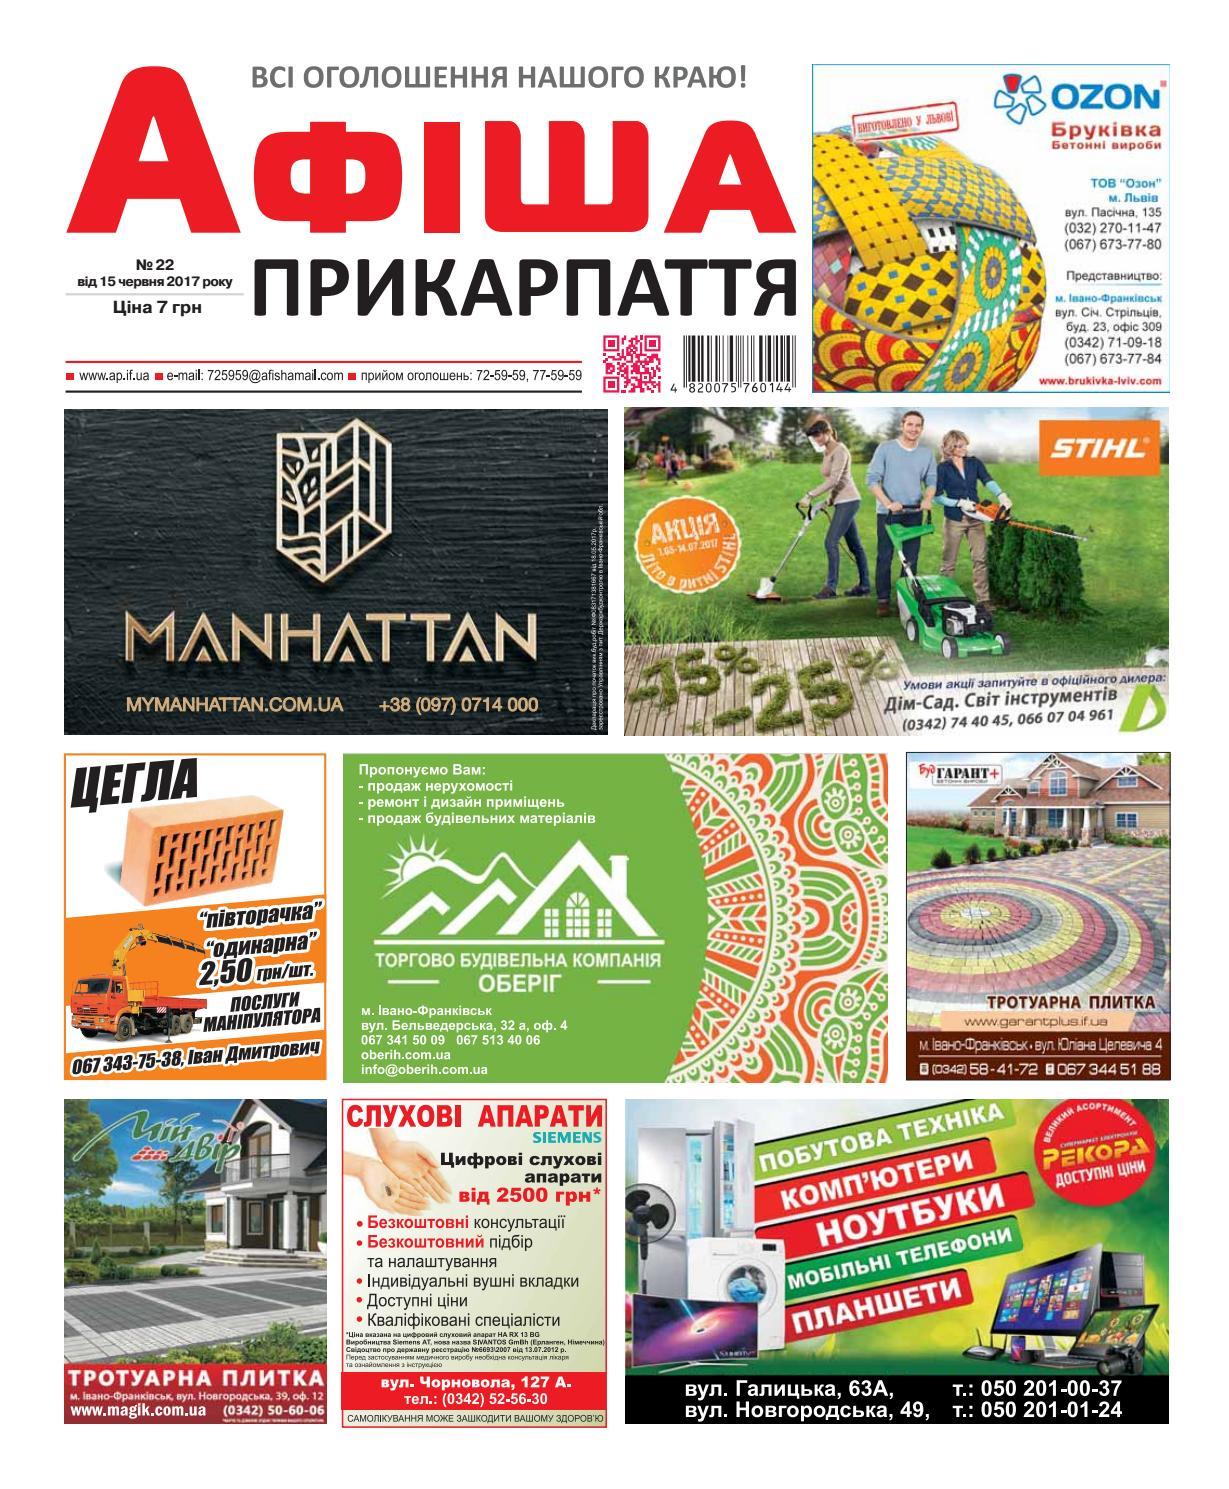 Афіша Прикарпаття 22 by Olya Olya - issuu 679453f7041cf